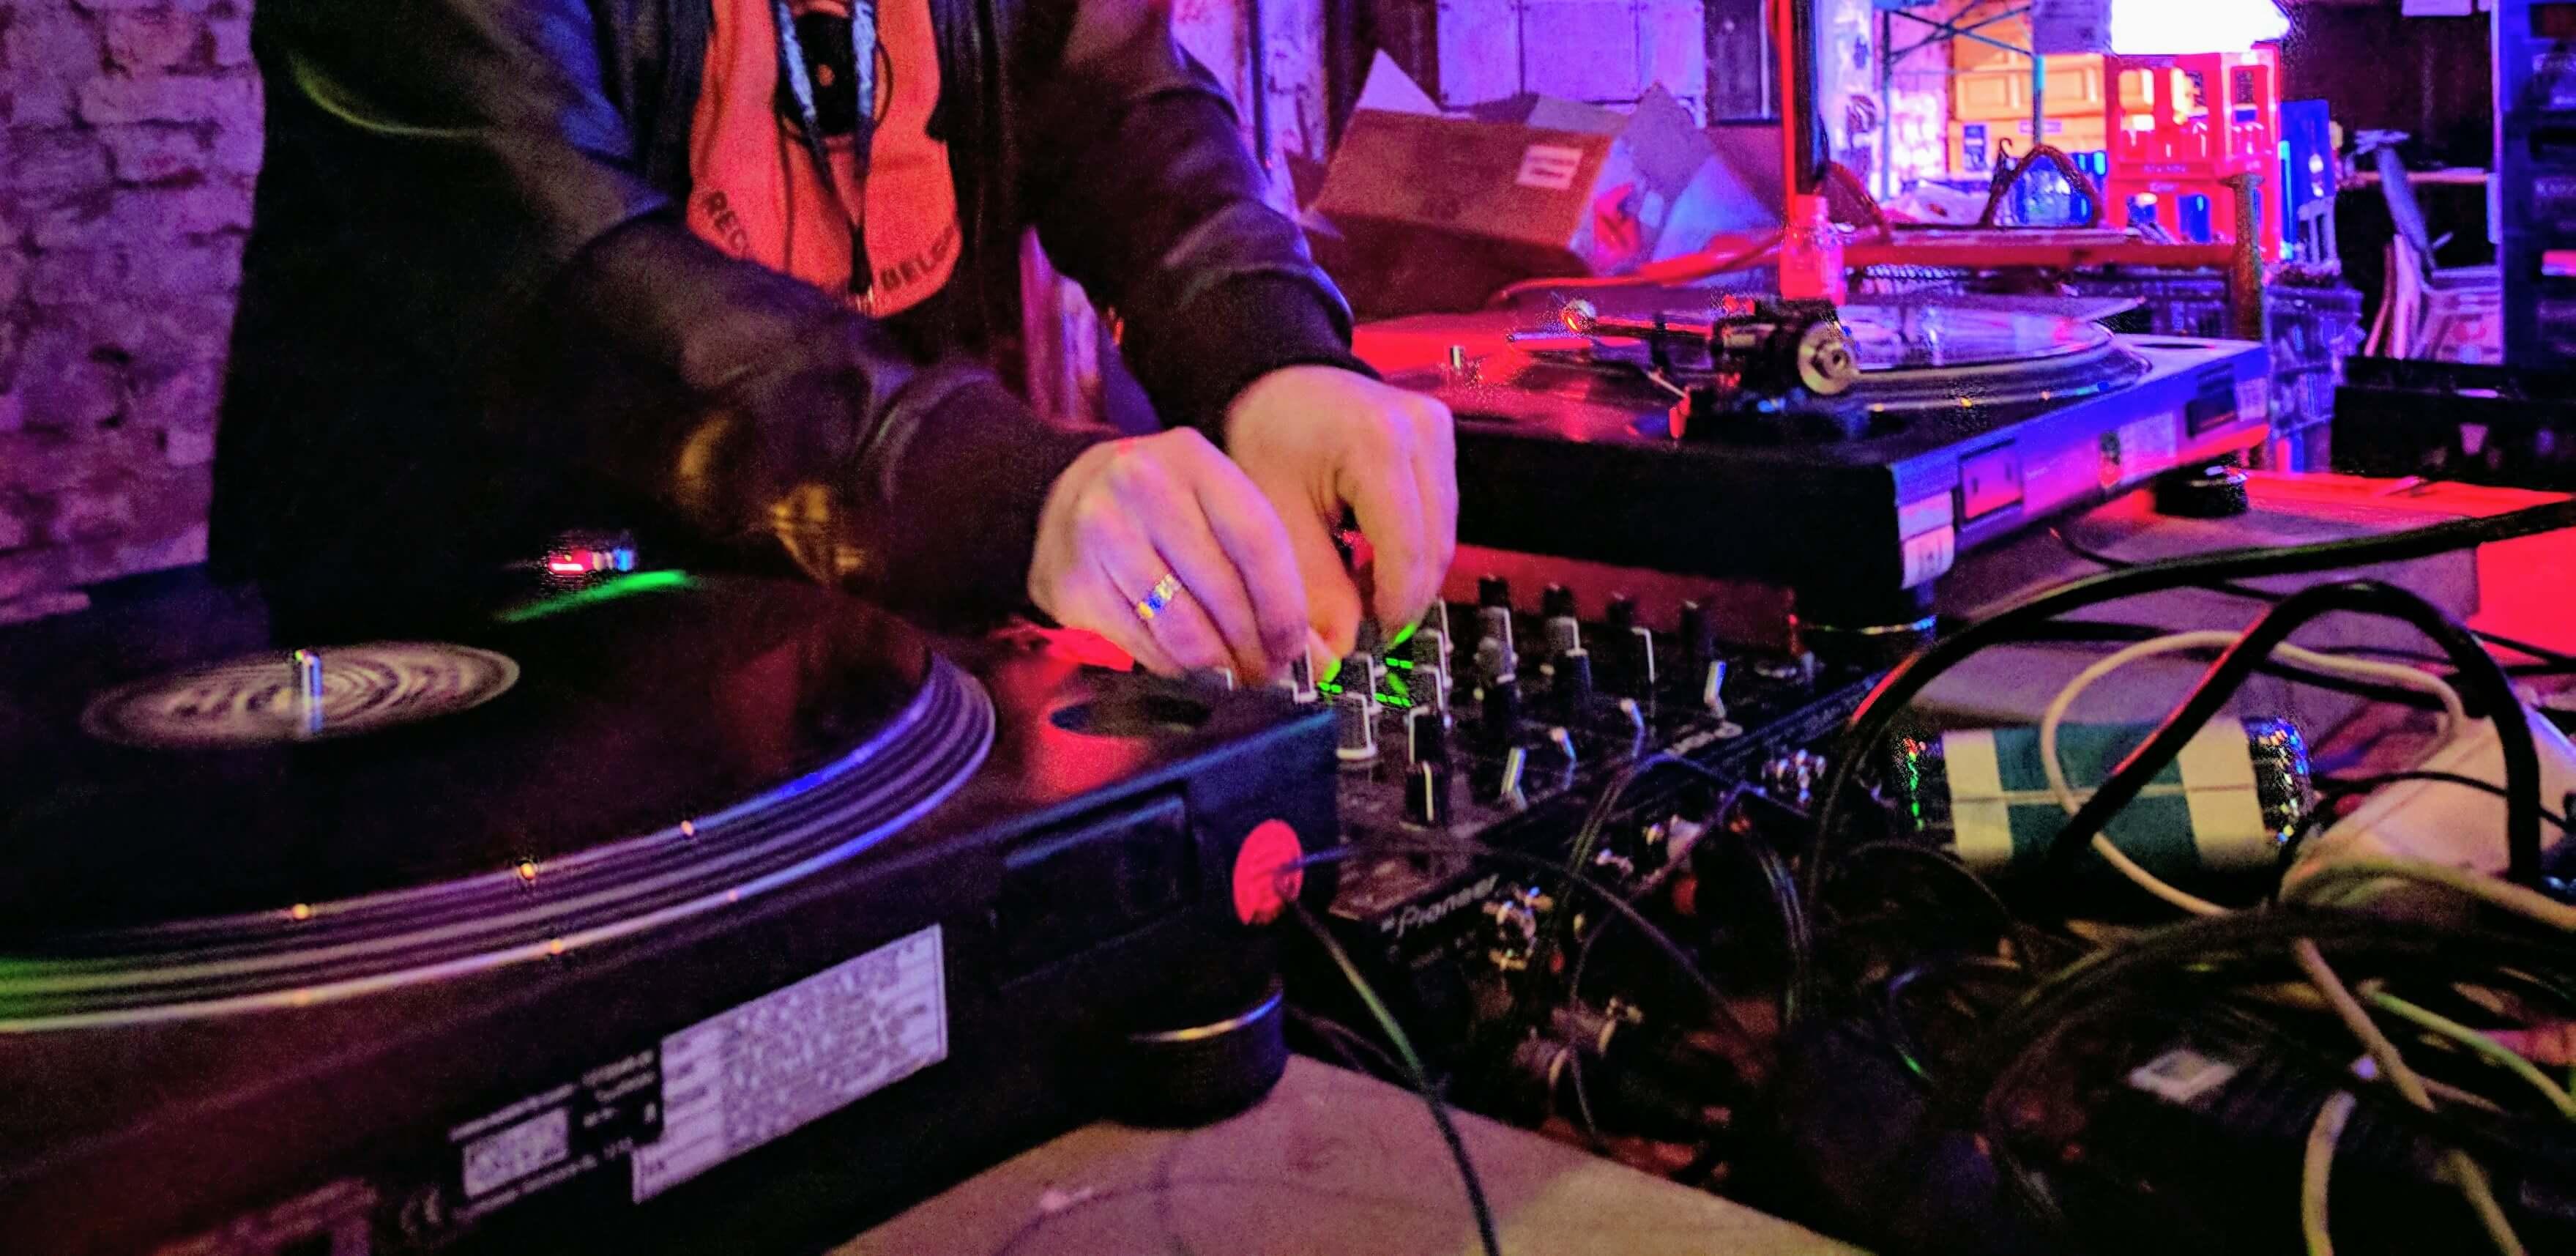 meilleure table de mixage dj